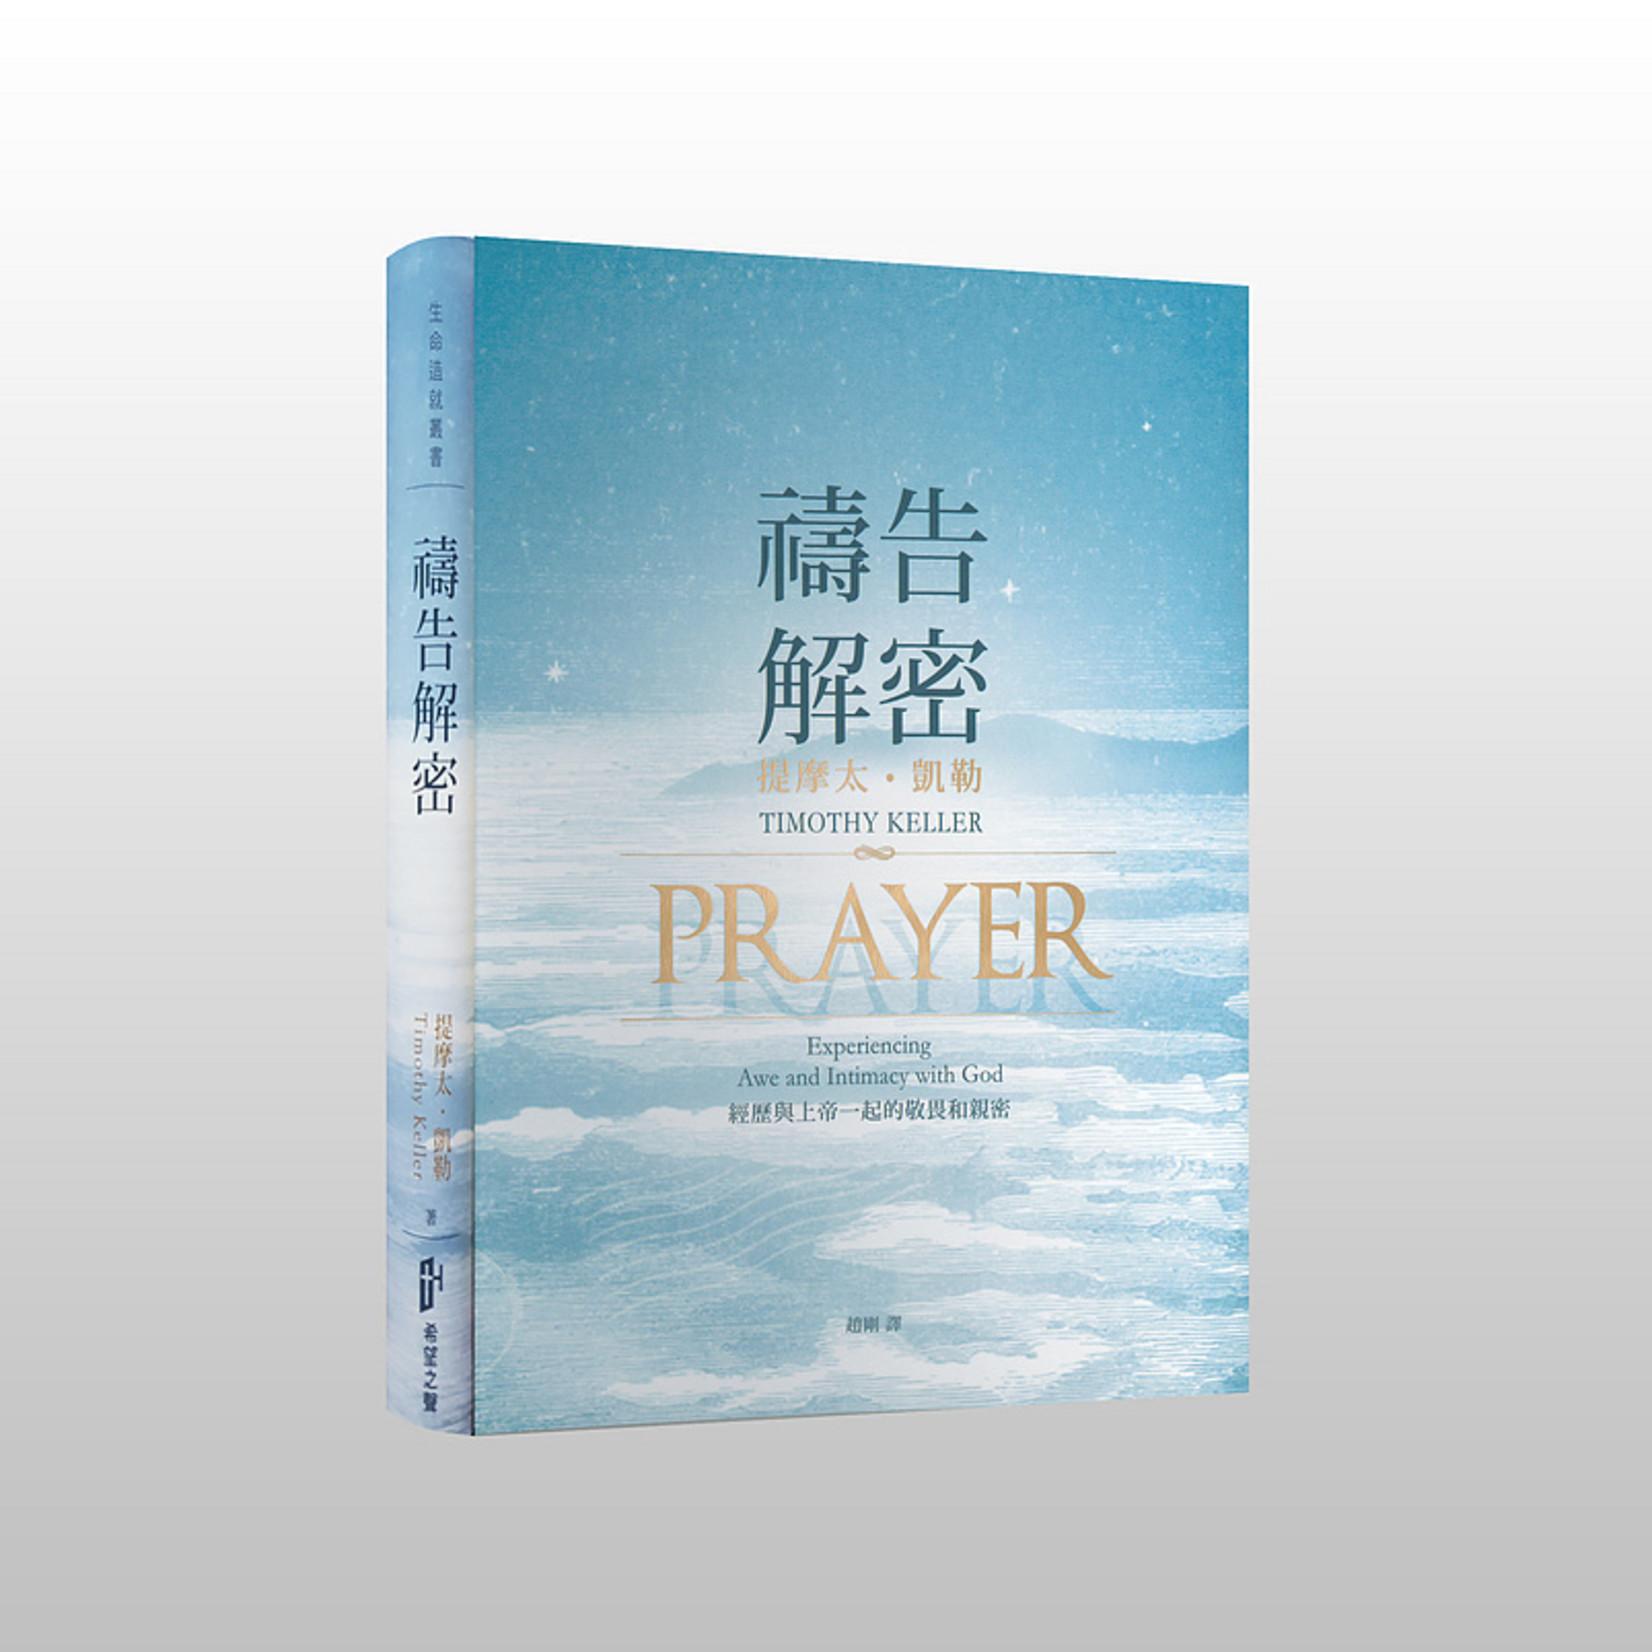 希望之聲 Voice of Hope 禱告解密:經歷與上帝一起的敬畏和親密 Prayer: Experiencing Awe and Intimacy with God